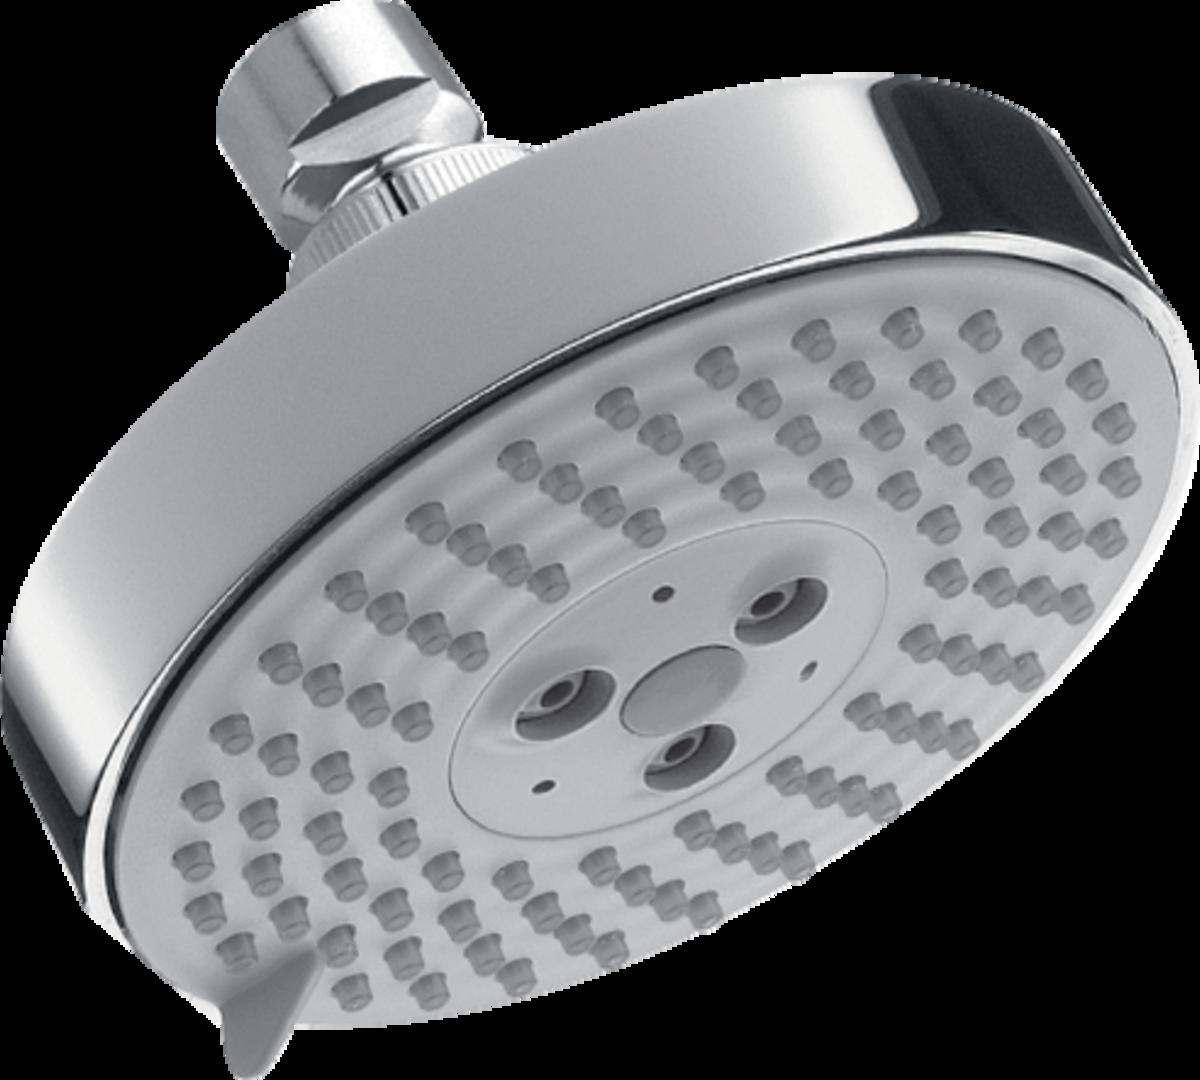 hansgrohe Showerheads: Raindance S, 3 spray modes, Art. no. 27457001 ...